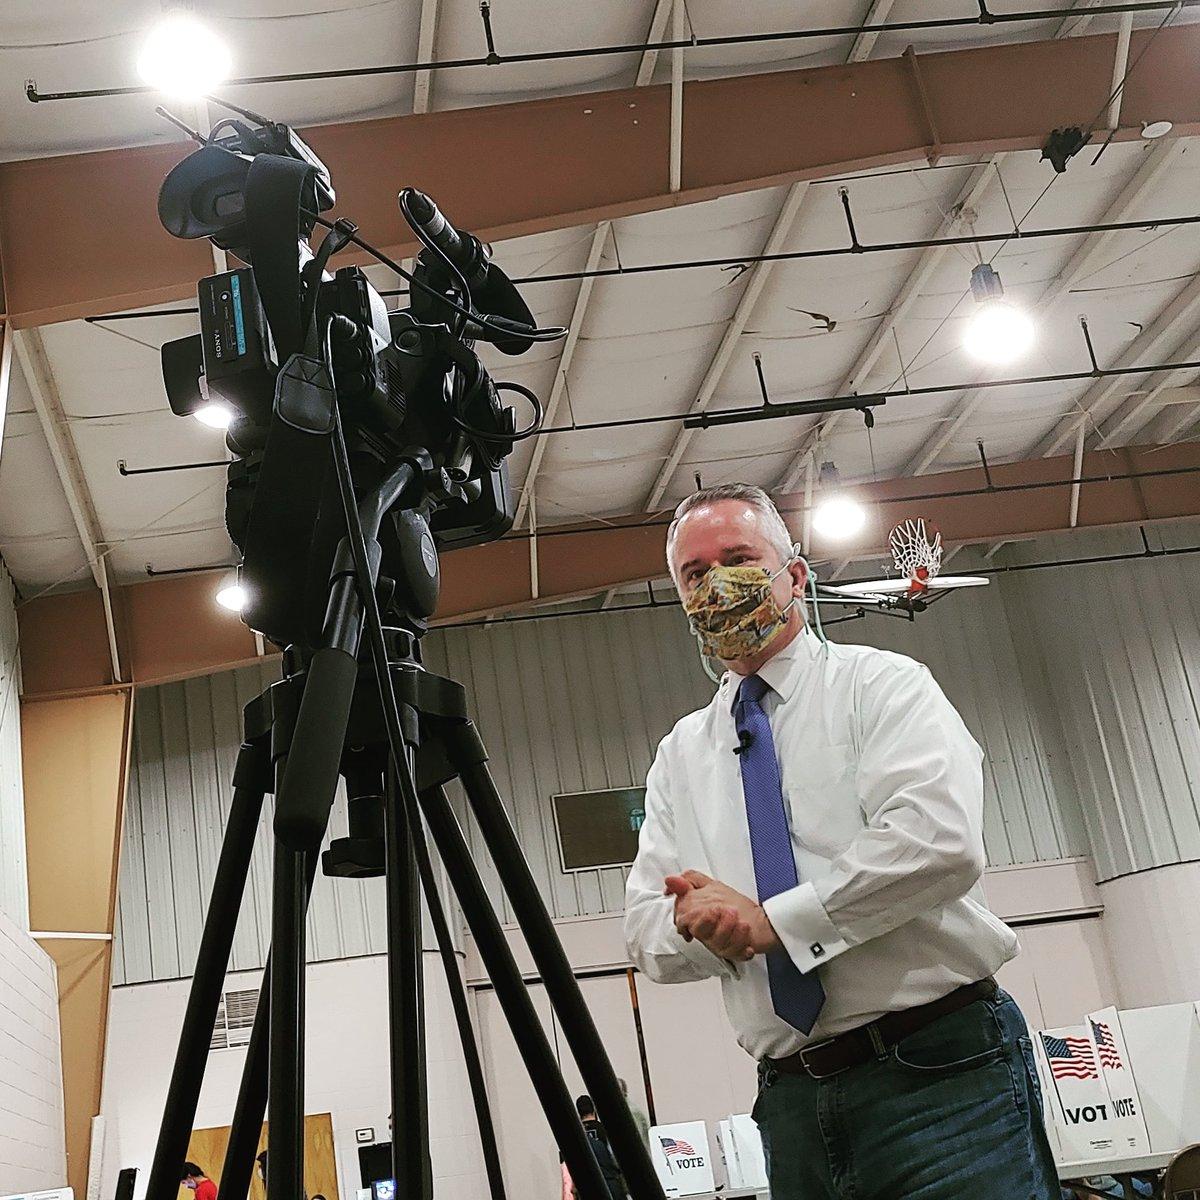 Masked live shot election coverage. Stupid covid. #reporterlife #newslife #liveshot #selfie #ElectionDay https://t.co/oK3Q0tUhfo